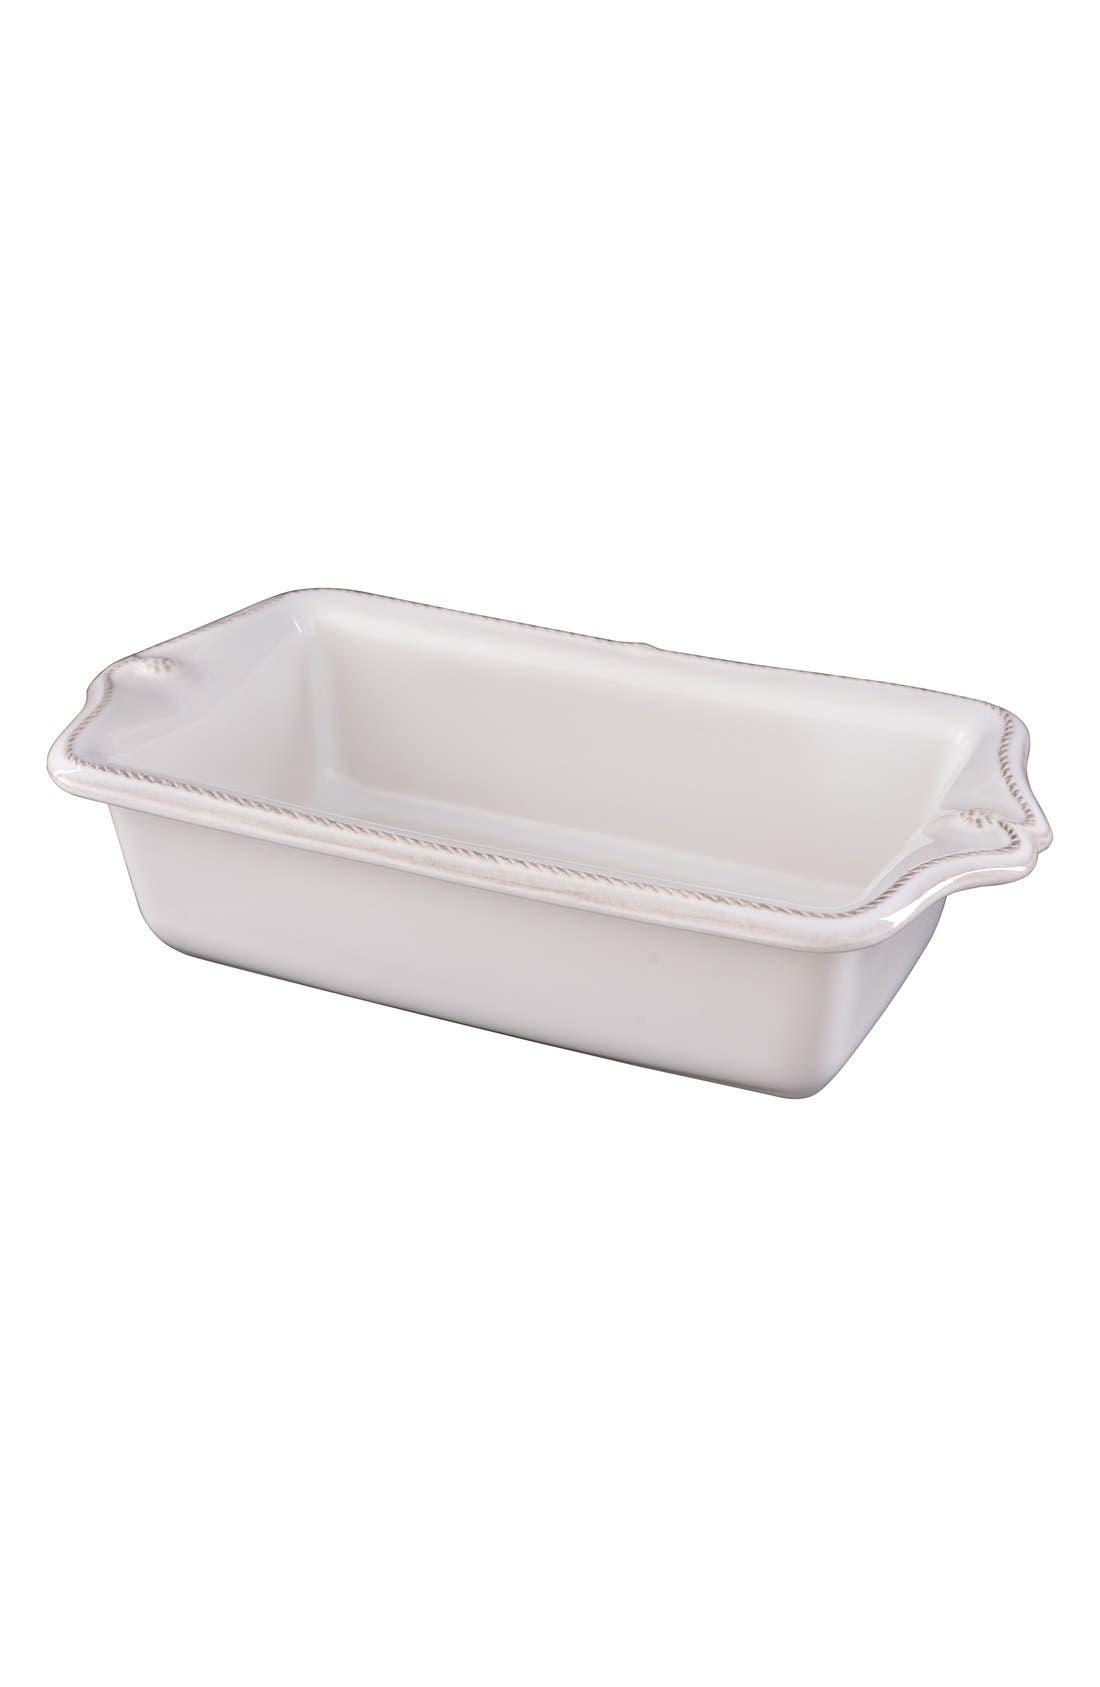 JULISKA 'Berry and Thread' Ceramic Loaf Pan